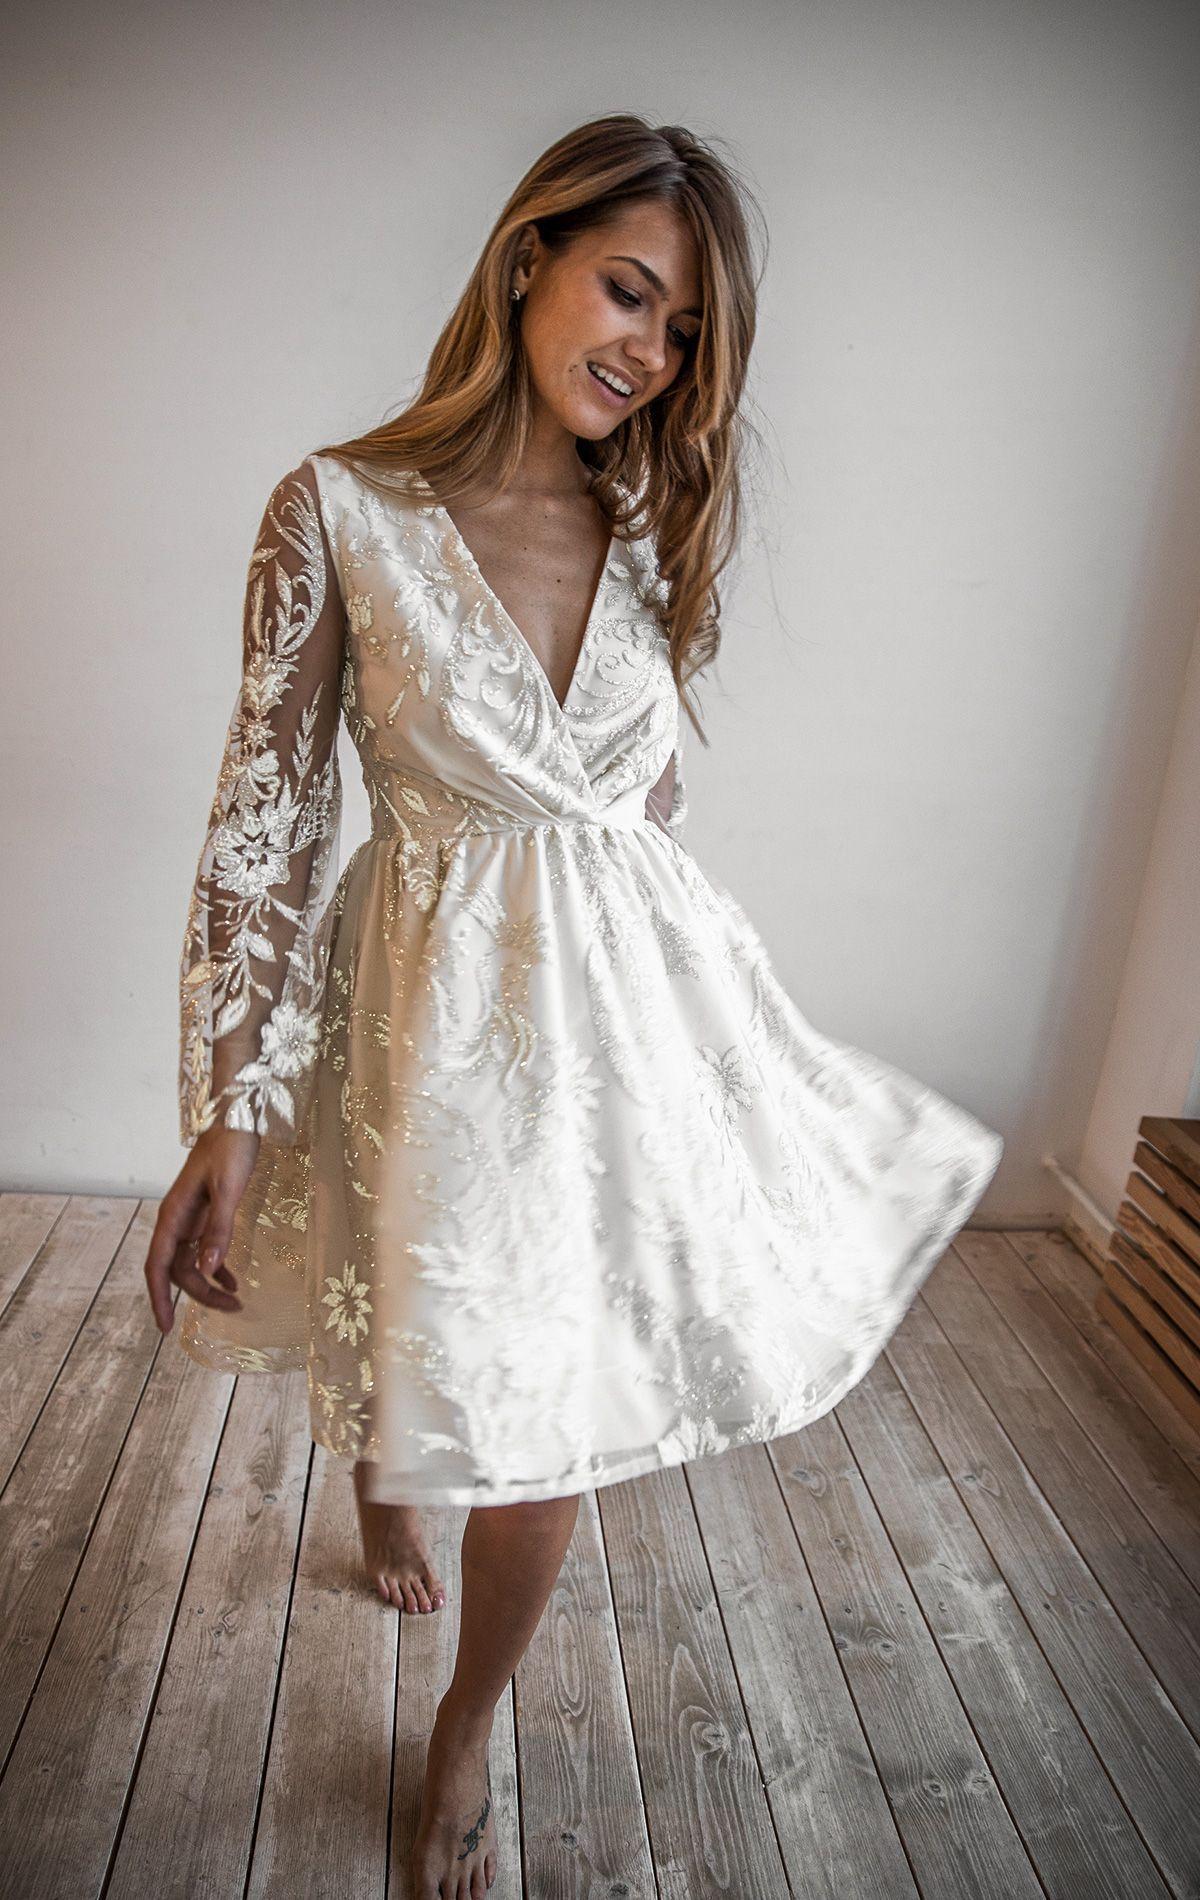 Kay By Olivia Bottega Lace Baby Doll Wedding Dress Baby Doll Etsy Doll Wedding Dress Casual Bridal Dress Short Lace Dress [ 1900 x 1200 Pixel ]